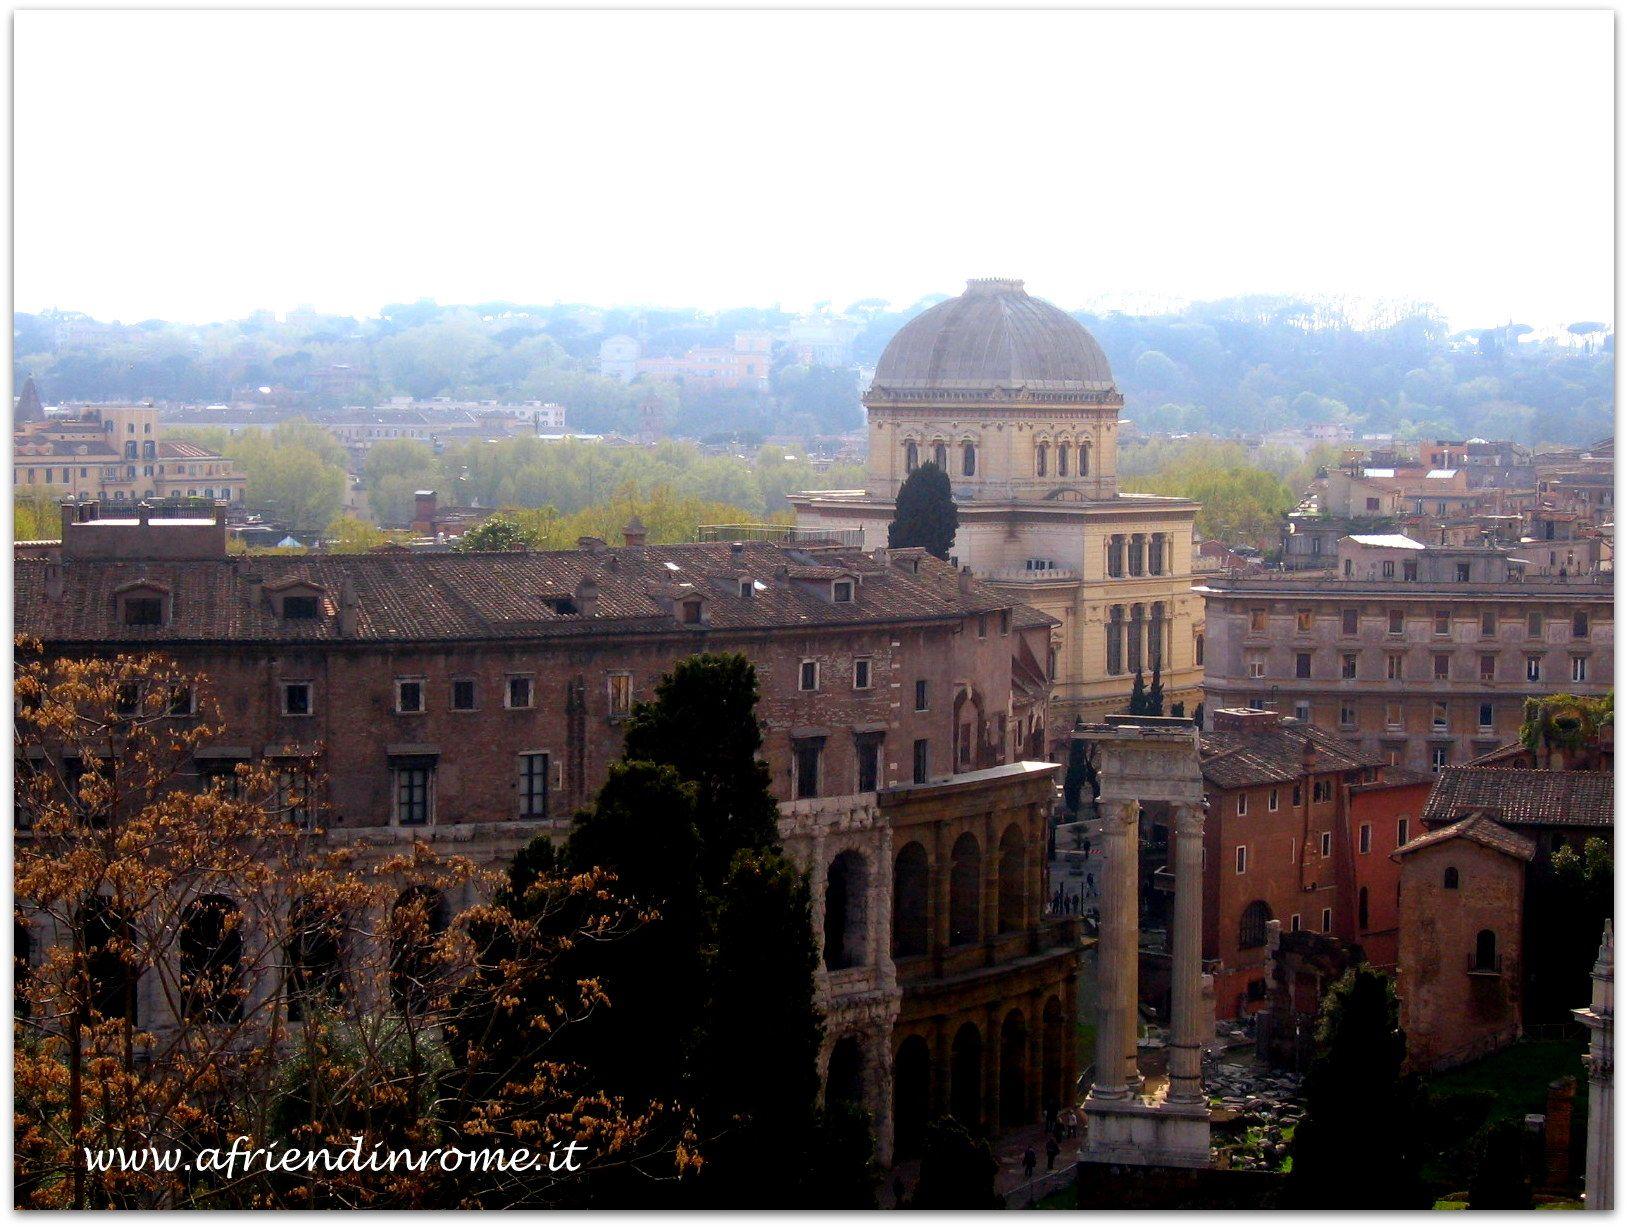 The view form Terrazza Caffarelli, a café open to the public next to ...